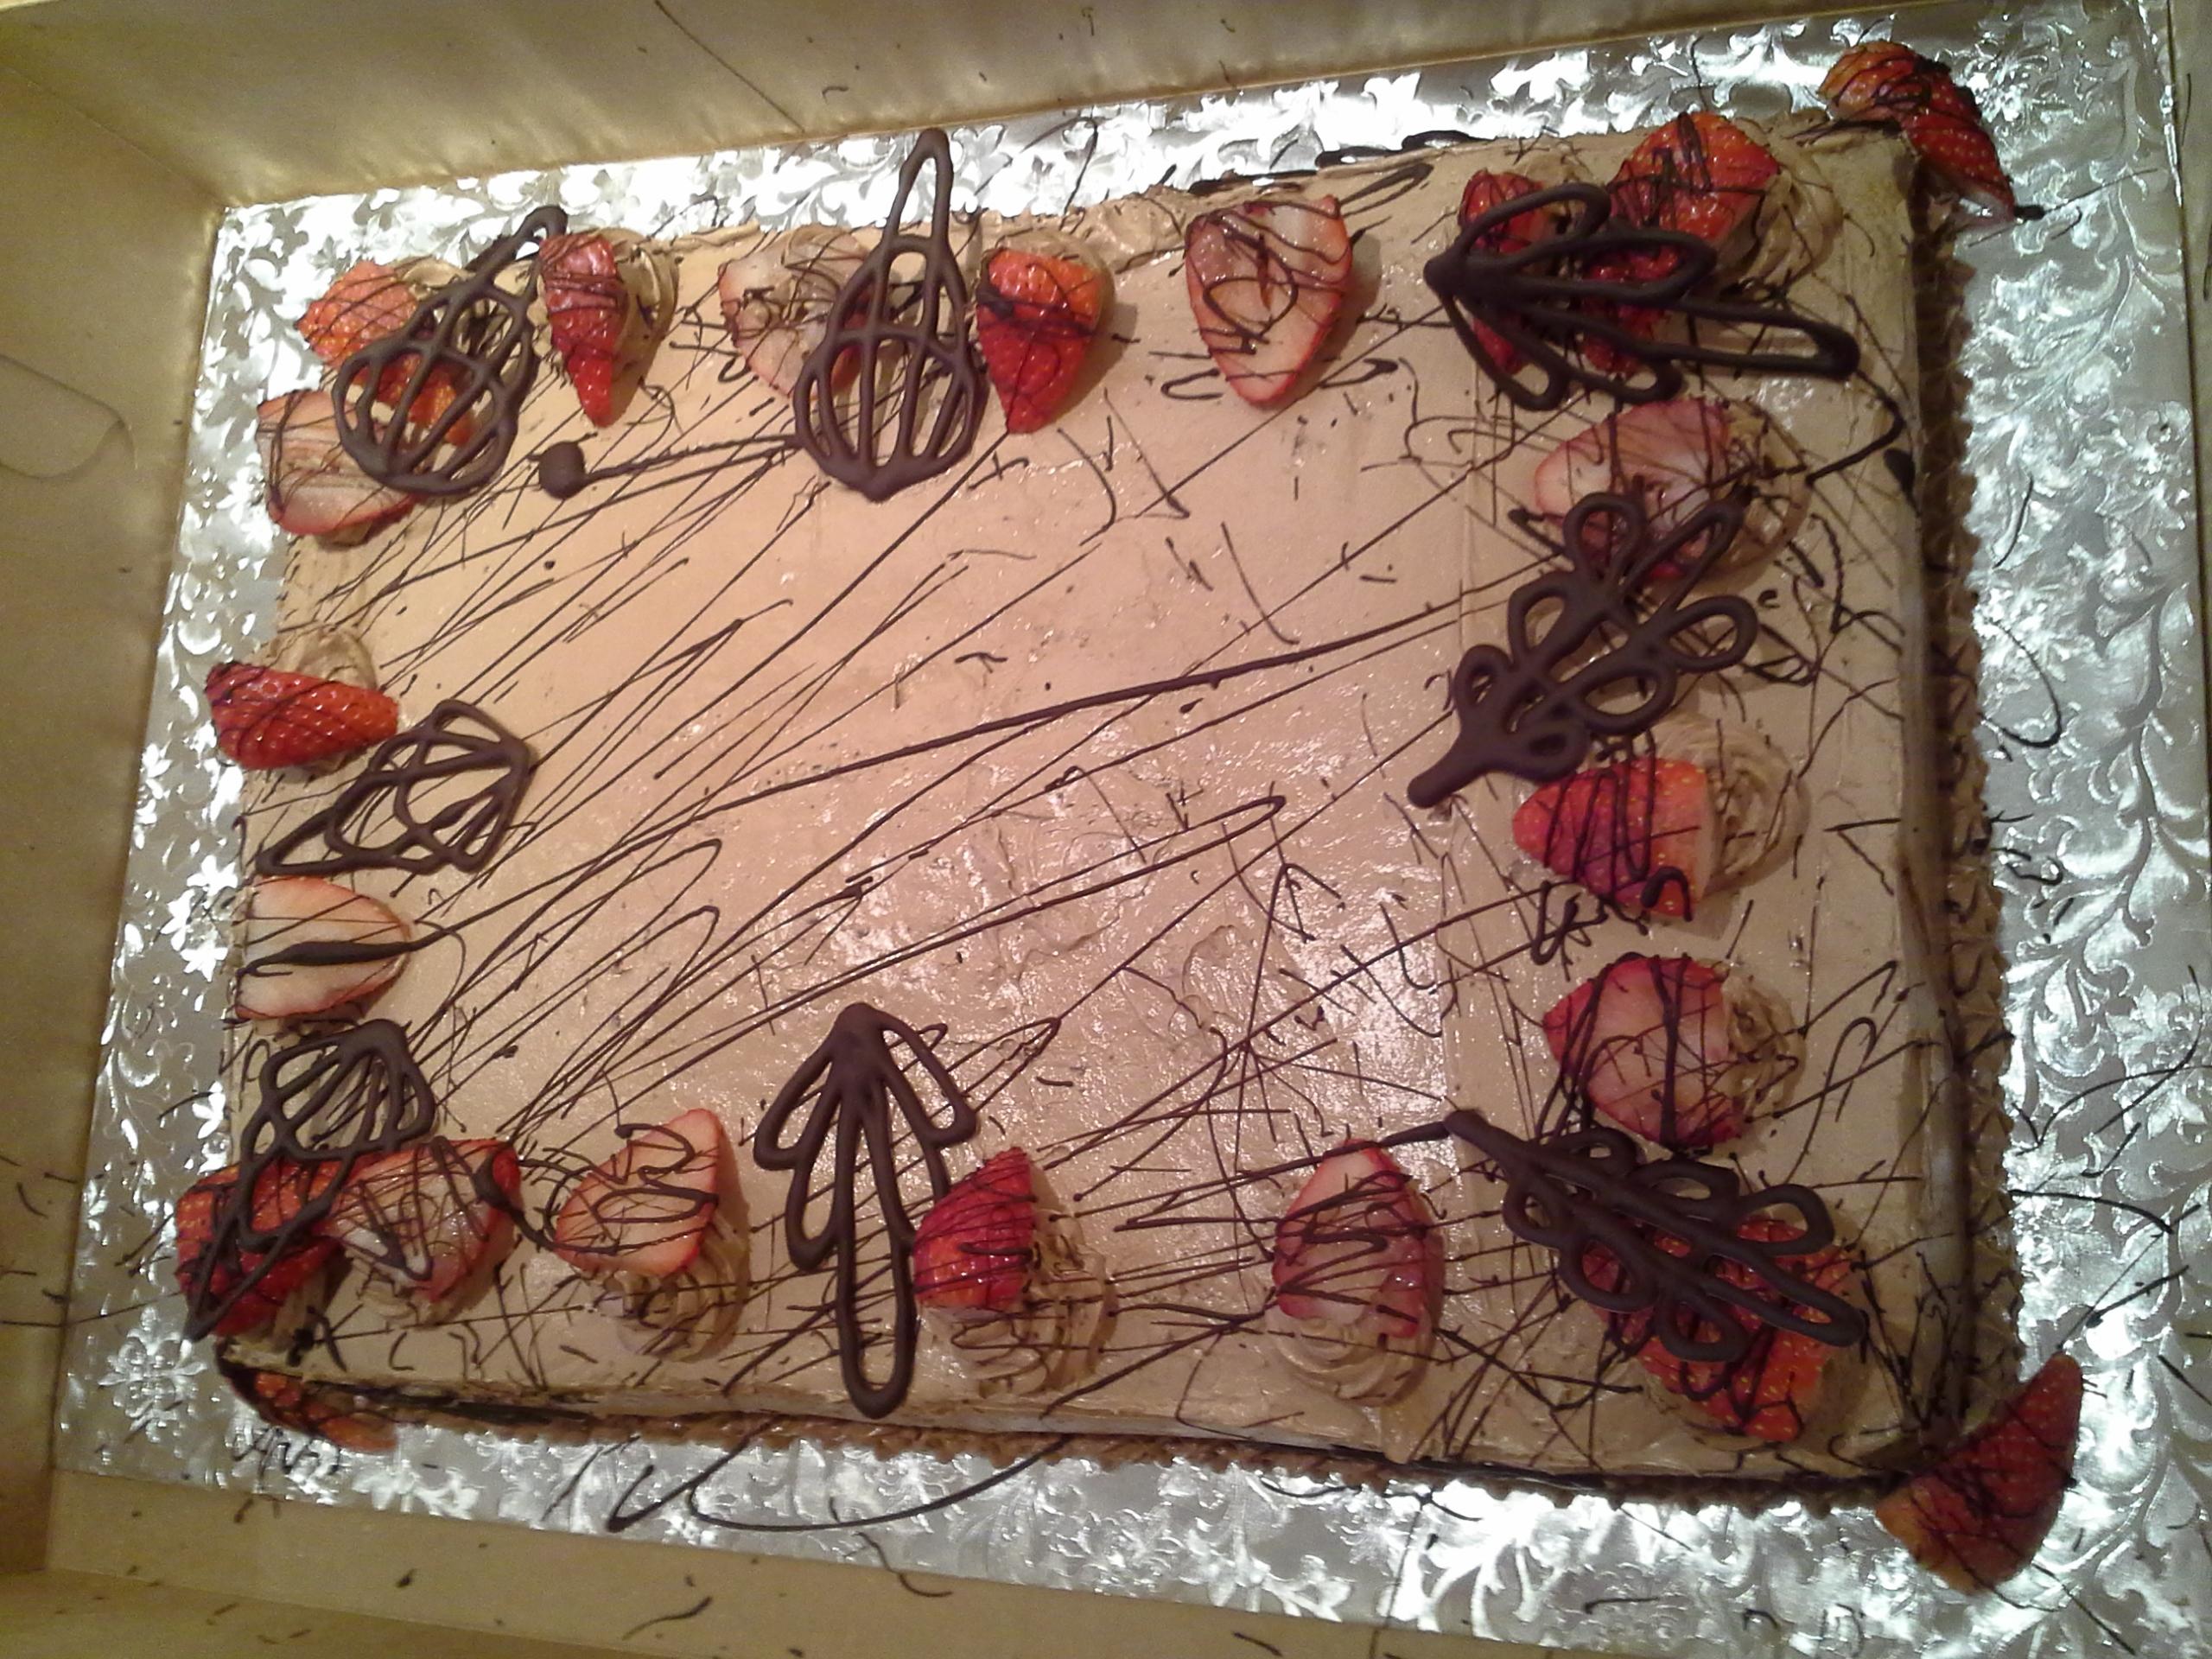 Chocolate cake, cake, strawberry,